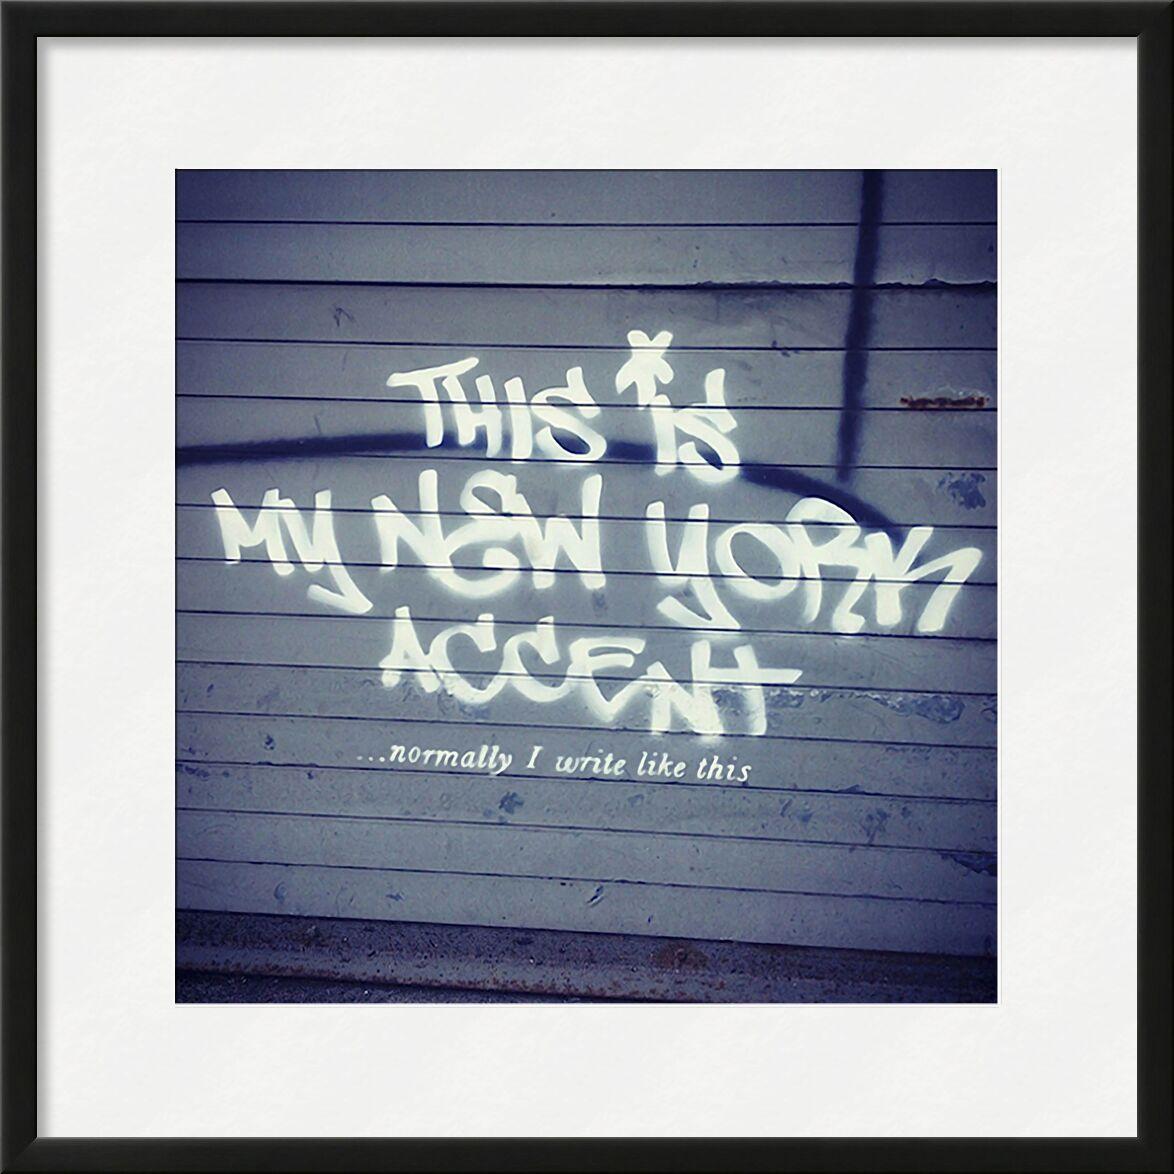 My New York Min - BANKSY from AUX BEAUX-ARTS, Prodi Art, banksy, New-York, street art, accent, min